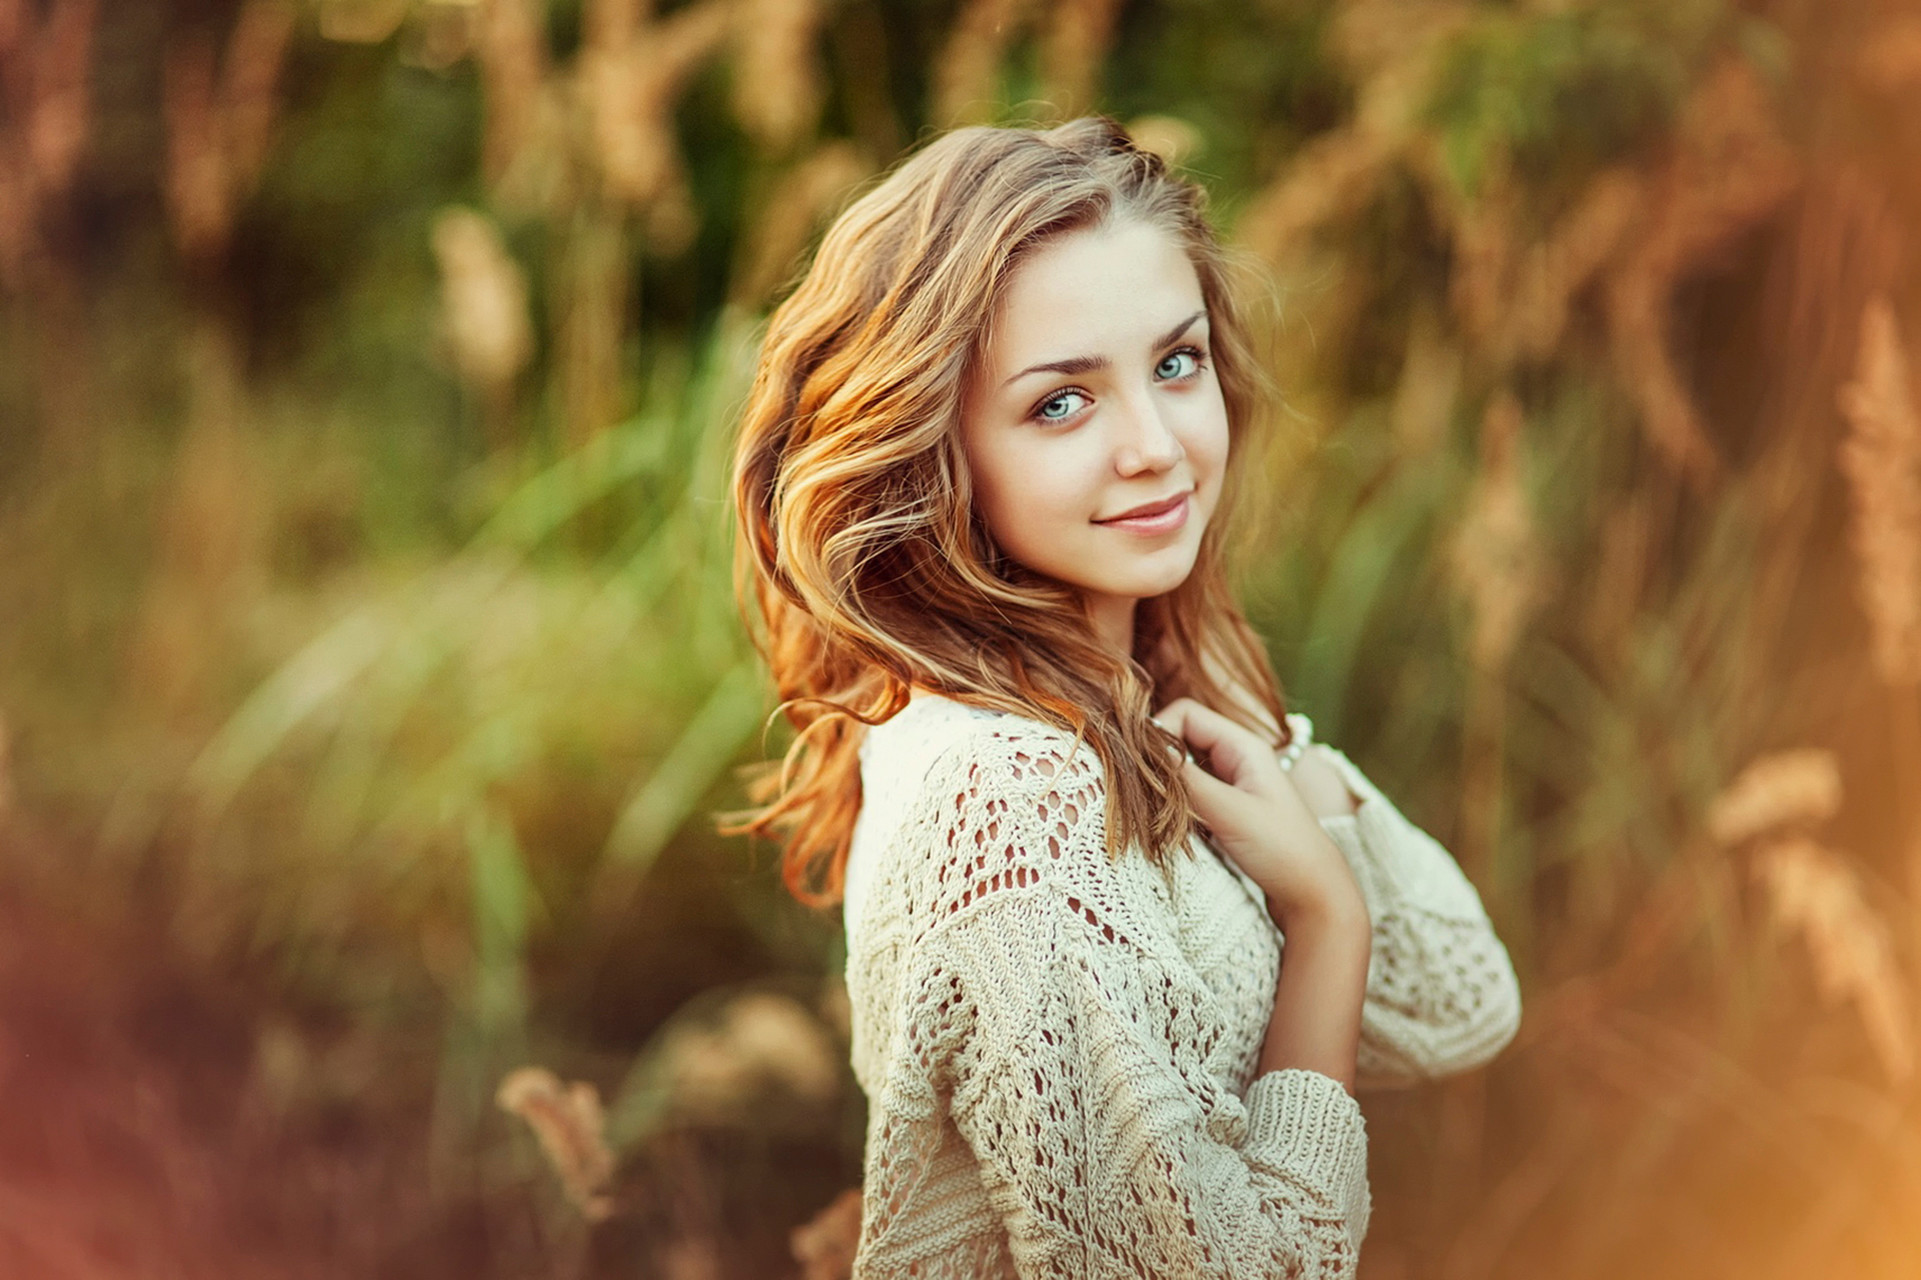 Wallpaper girl, teen, cute smile, bokeh wallpapers miscellanea .